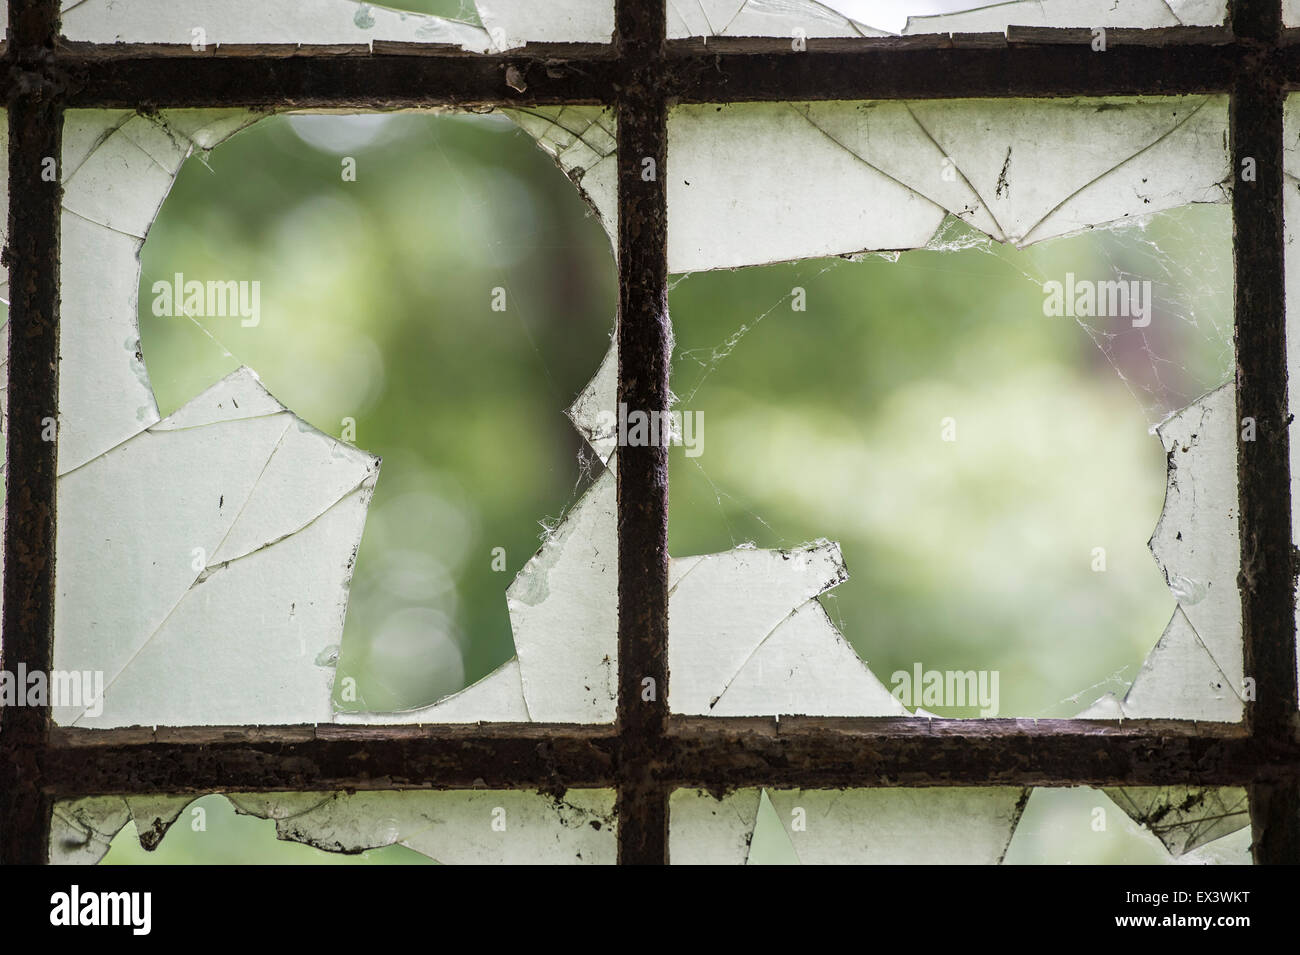 Broken glass windows - Stock Image